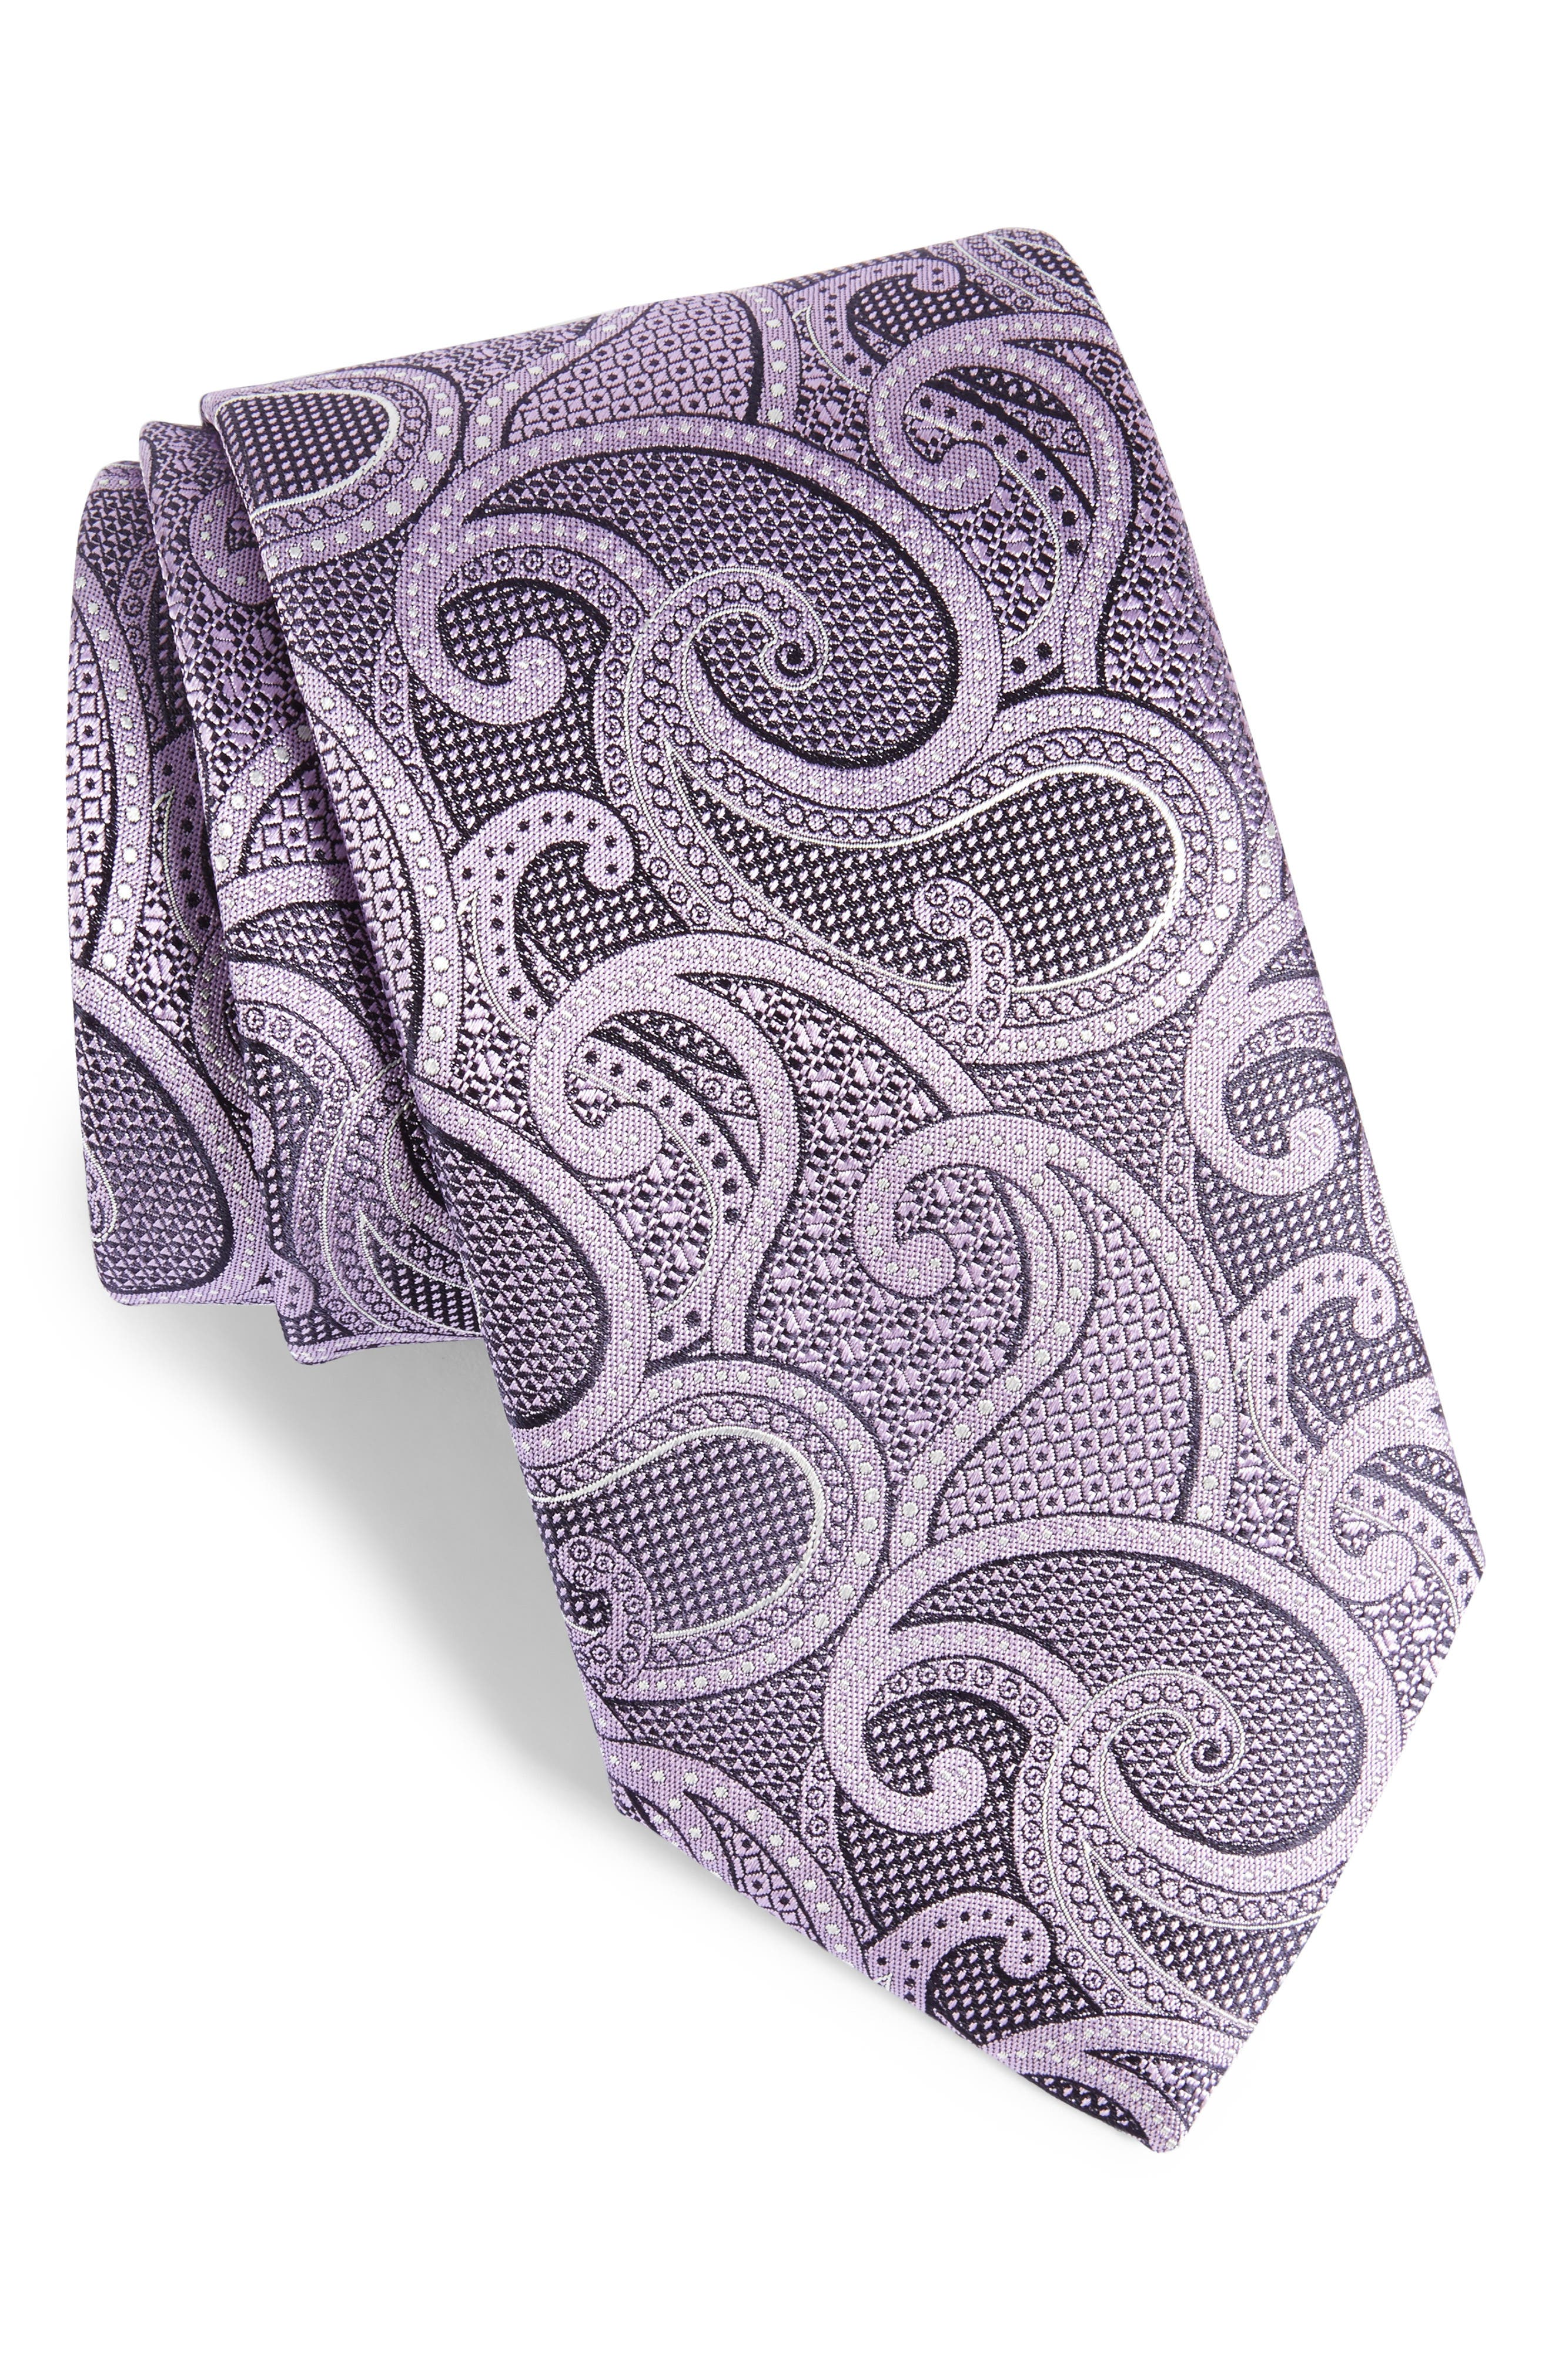 Main Image - Canali Paisley Silk Tie (X-Long)